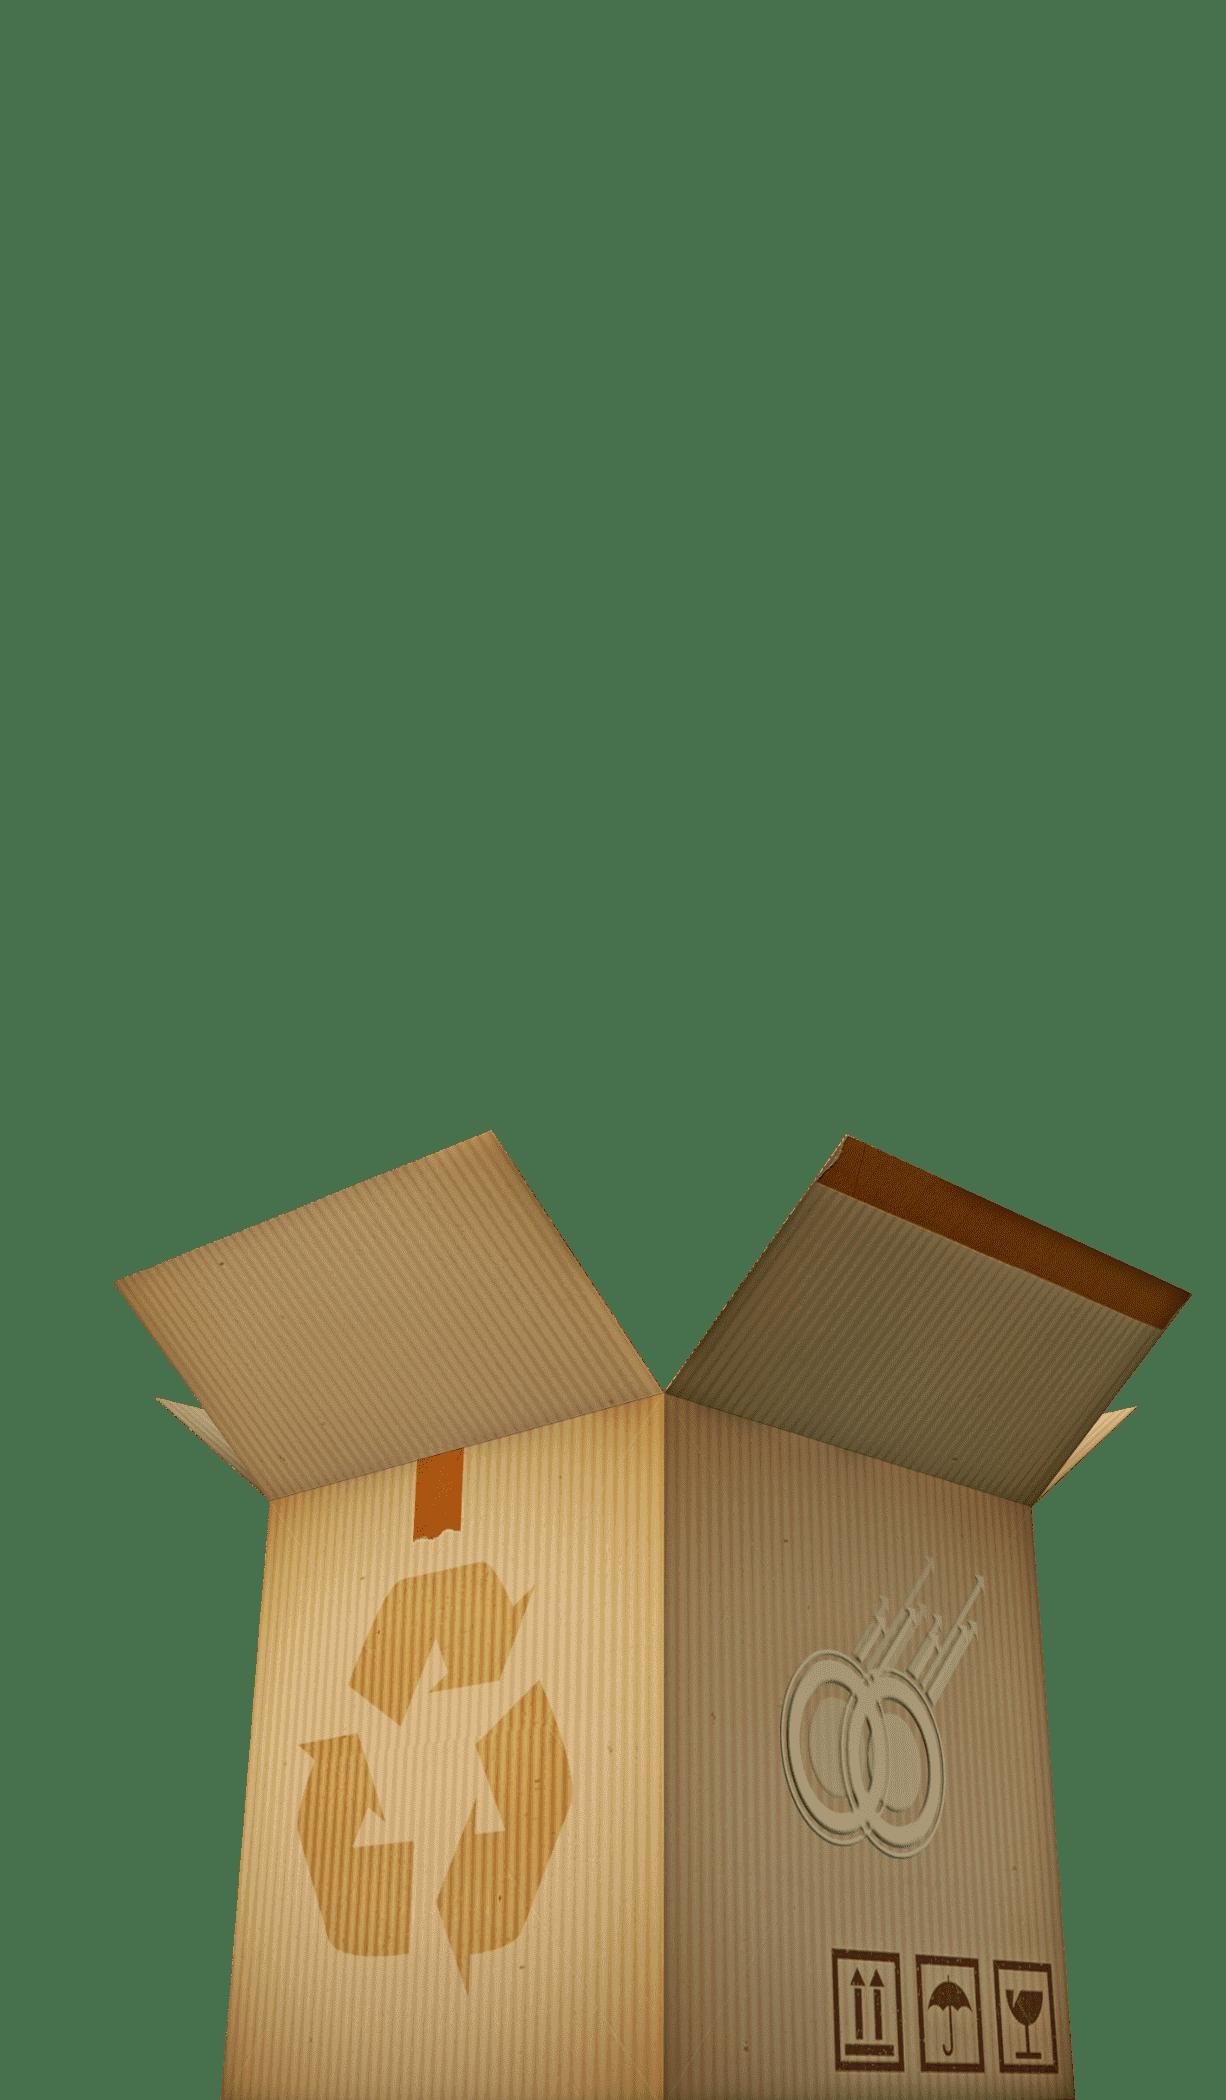 Cardboard box with recycling logo